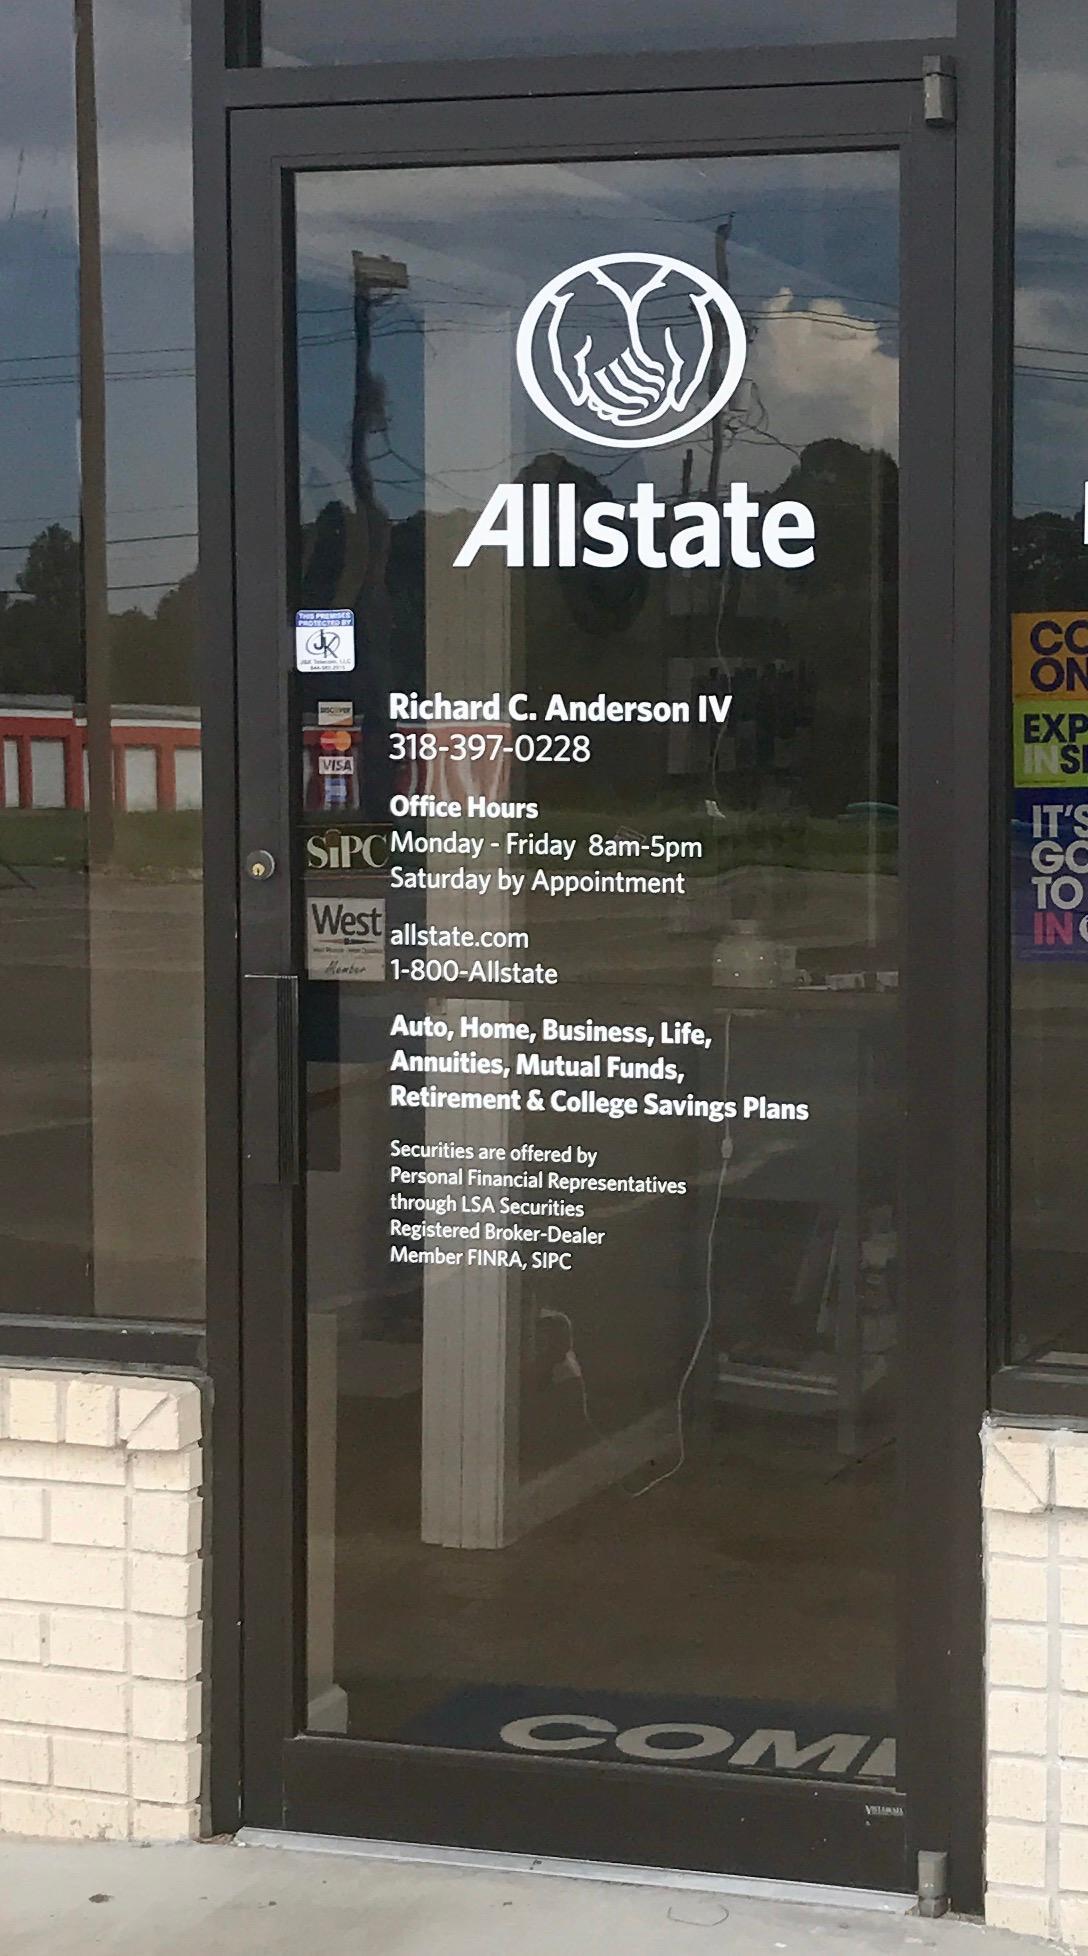 Richard C Anderson IV: Allstate Insurance image 2